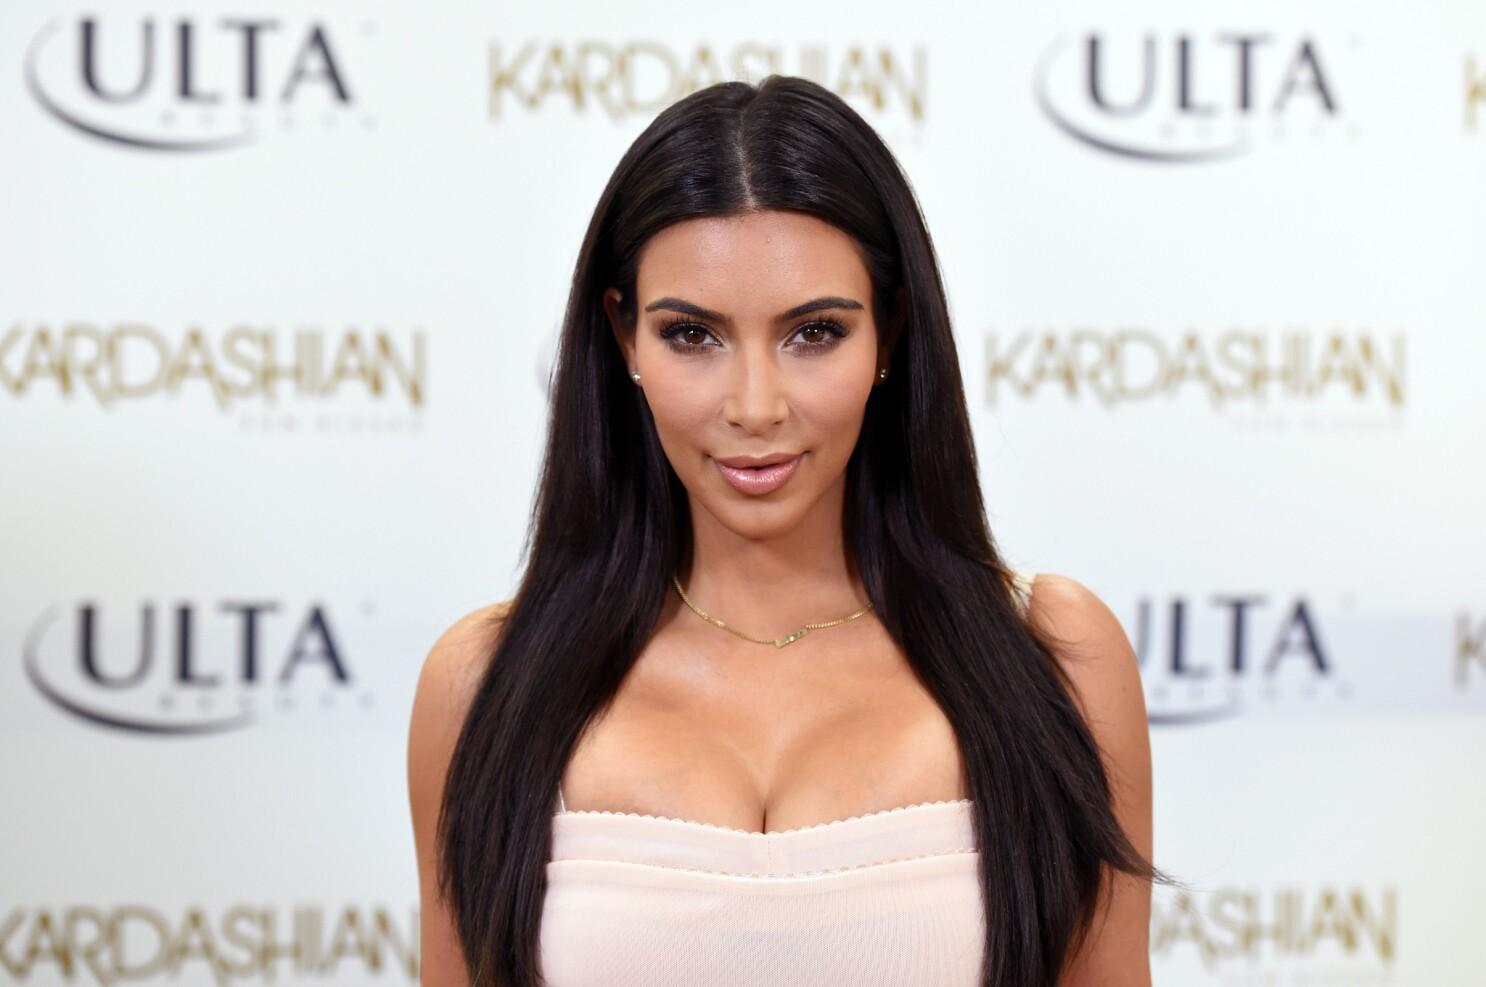 Kim Kardashian West appeals to Trump to free rapper ASAP Rocky